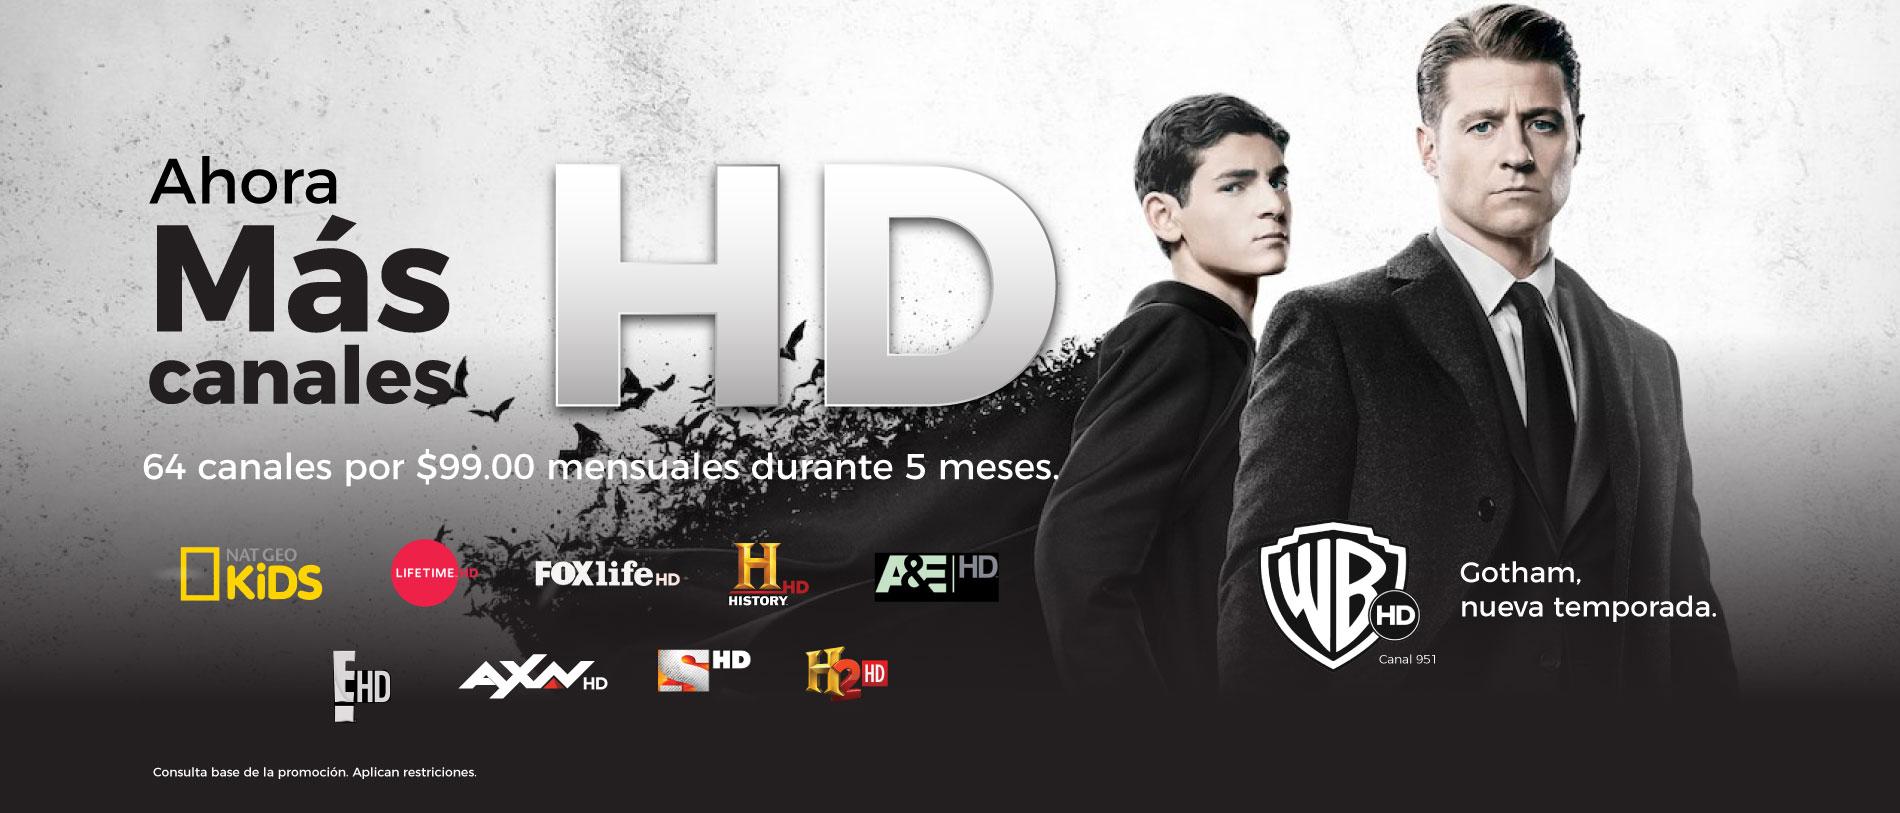 Paquete HD de Gigacable